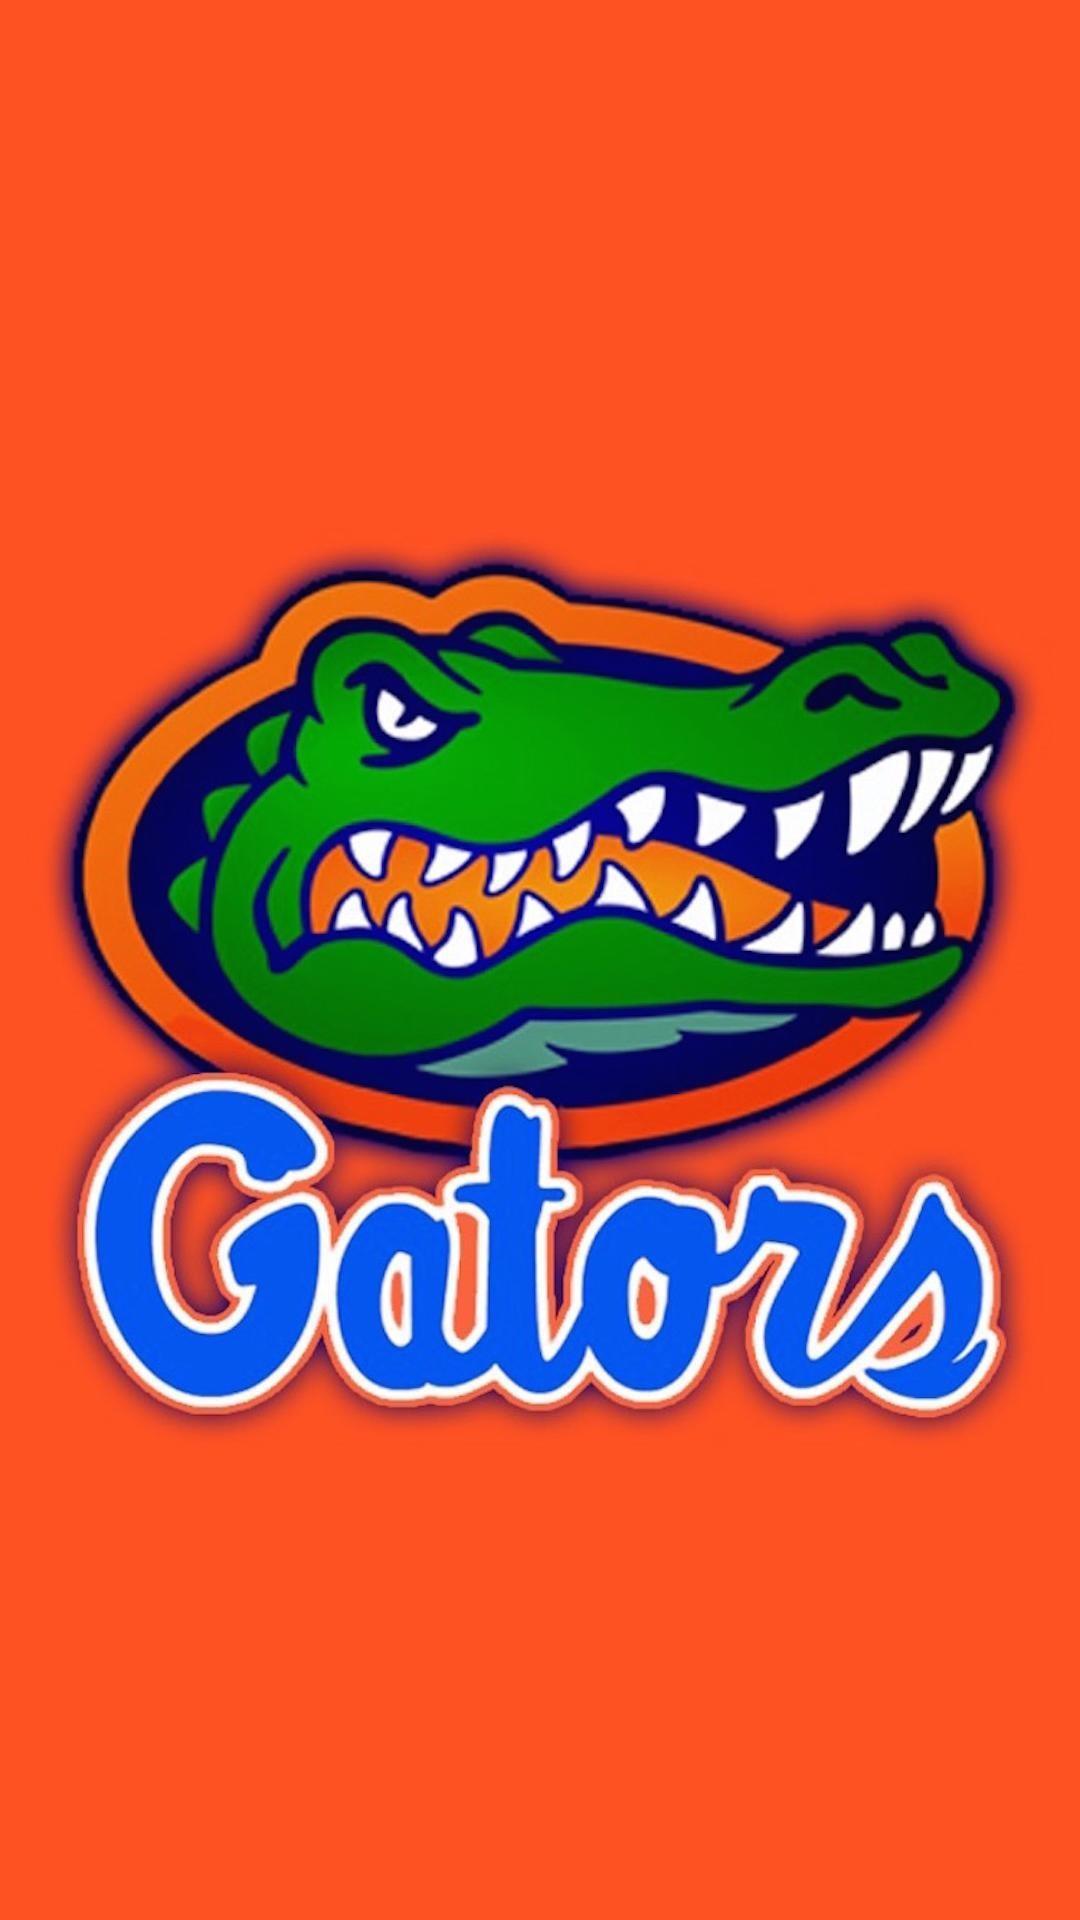 Florida gators wallpaper iphone 67 images - Florida gators background ...